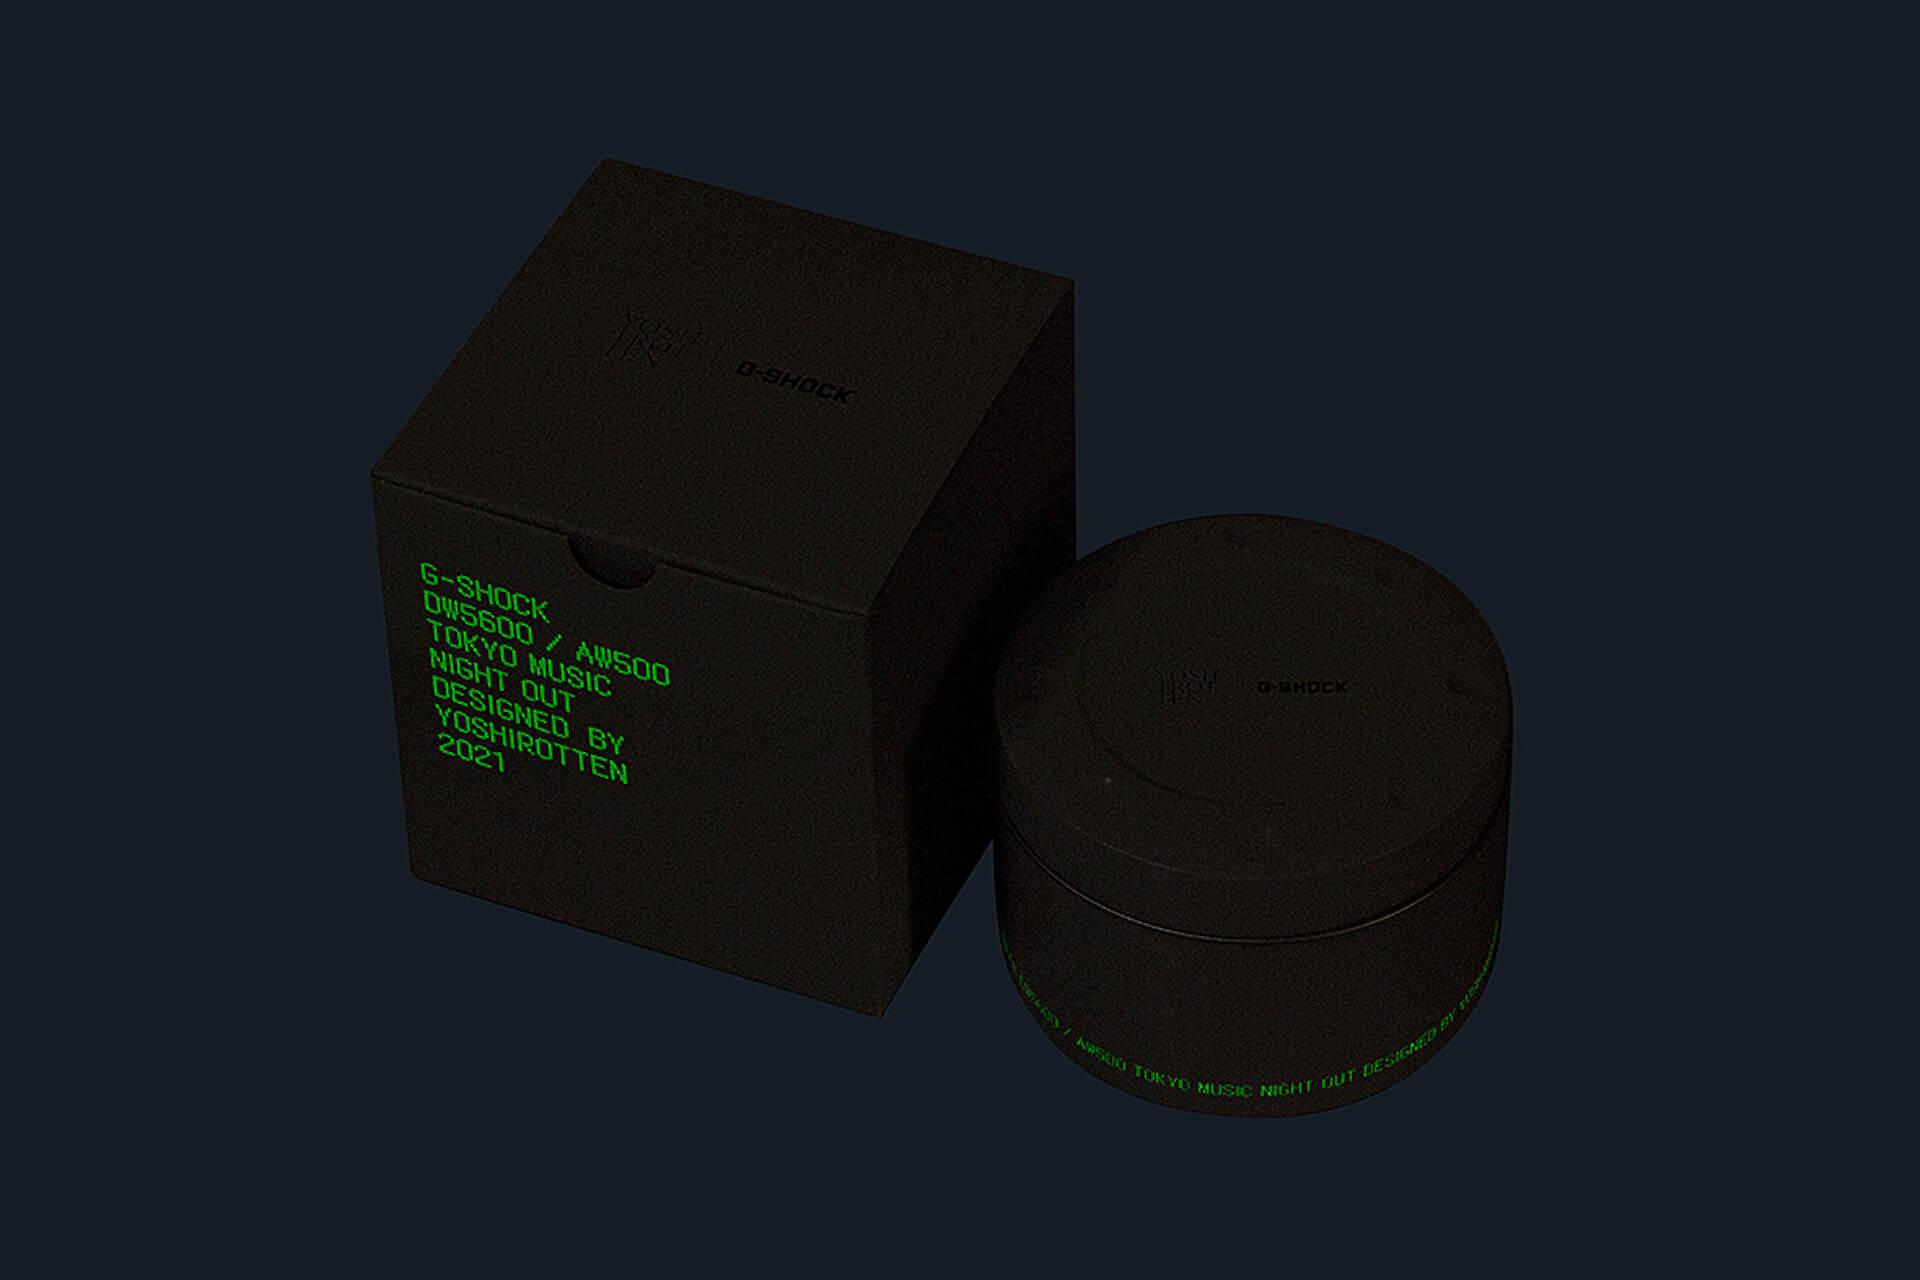 G-SHOCKとYOSHIROTTENのコラボウォッチが発売決定!DW-5600とAW-500をベースにした2モデルが登場 tech210602_gshock_yoshirotten_7